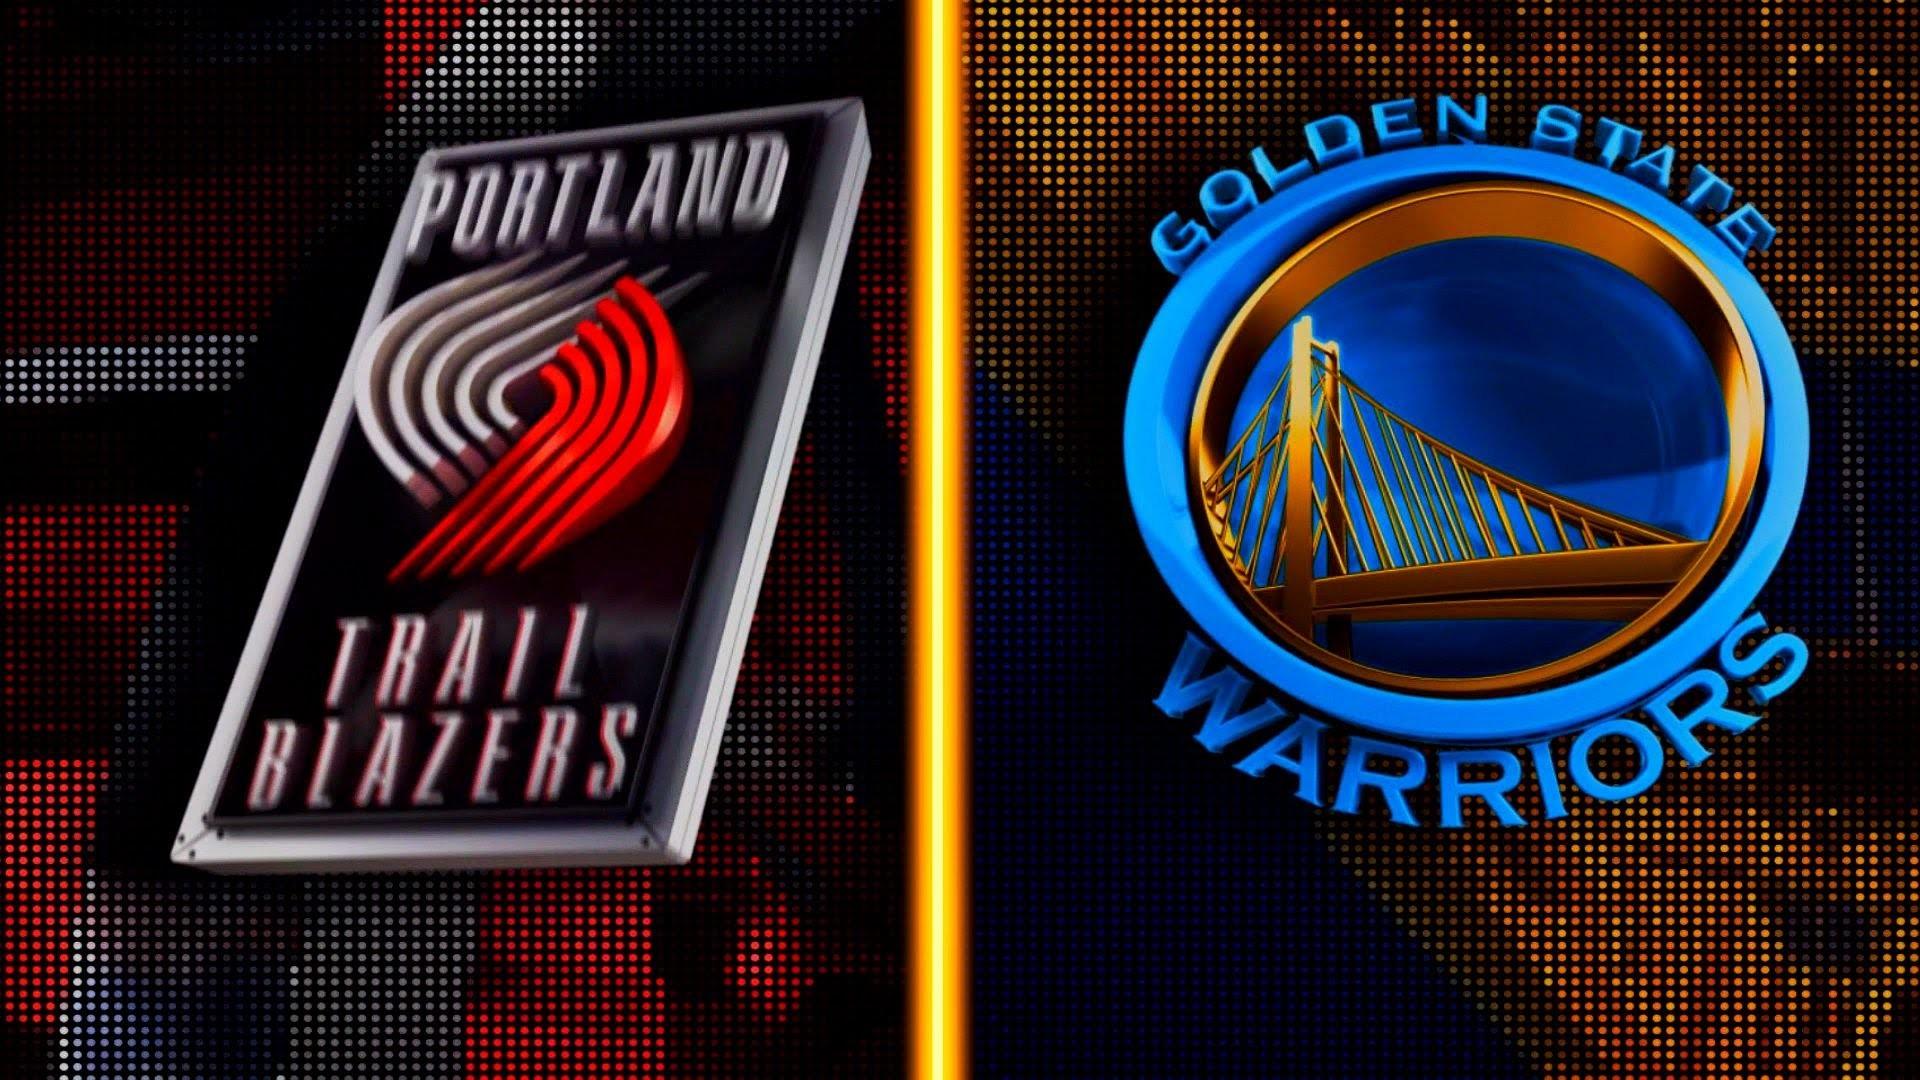 PS4: NBA 2K16 – Portland Trail Blazers vs. Golden State Warriors [1080p 60  FPS] – YouTube